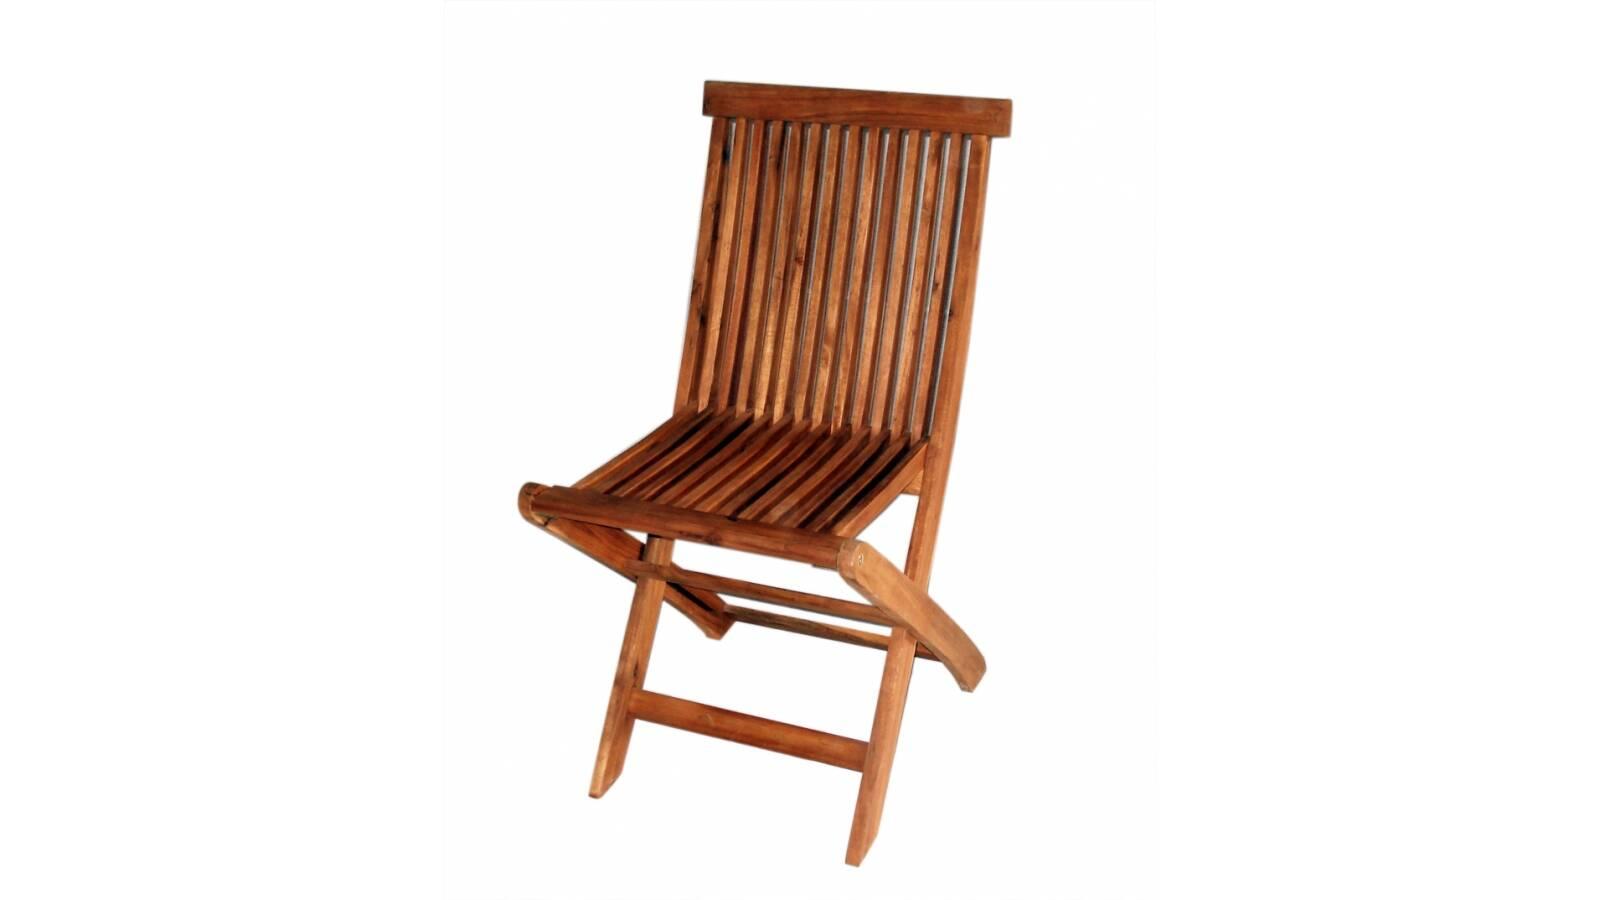 Silla plegable sin posabrazos en madera de acacia